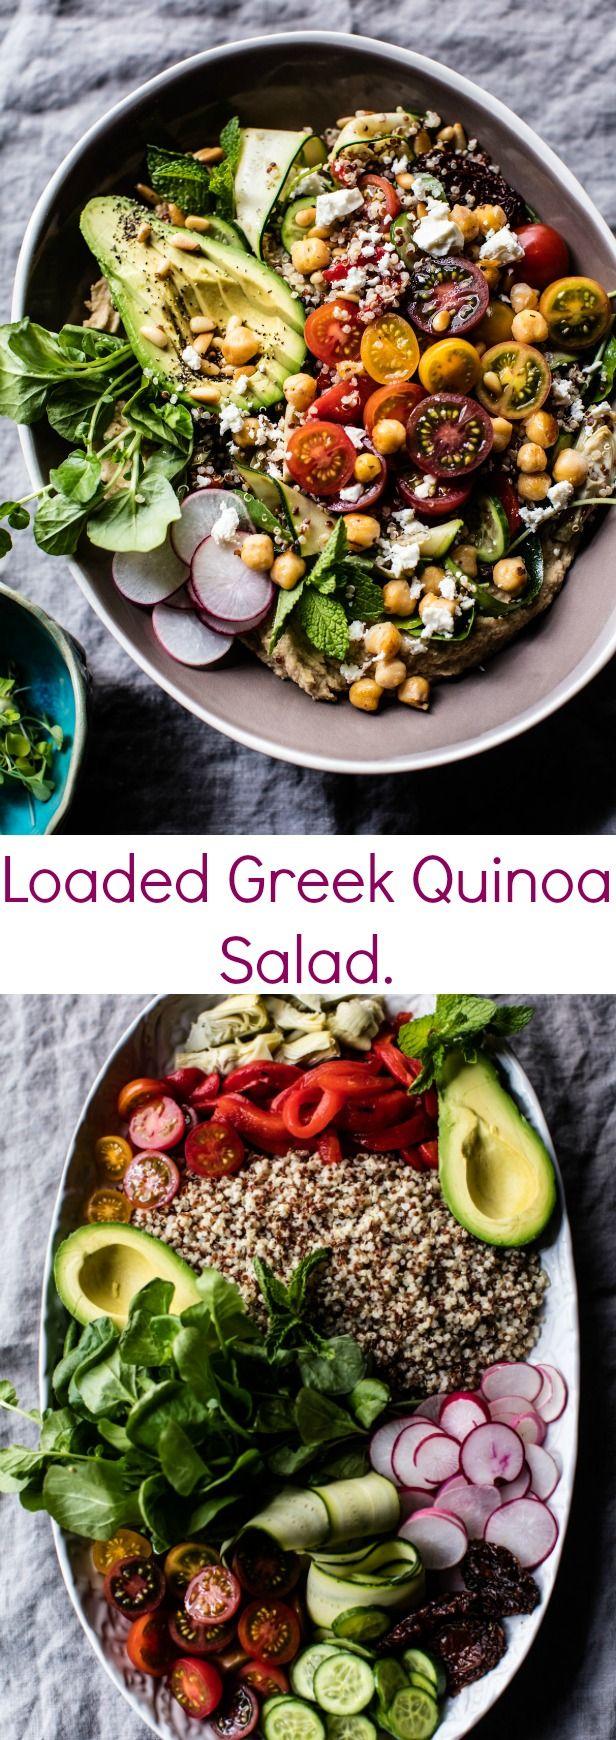 Loaded Greek Quinoa Salad | halfbakedharvest.com @hbharvest